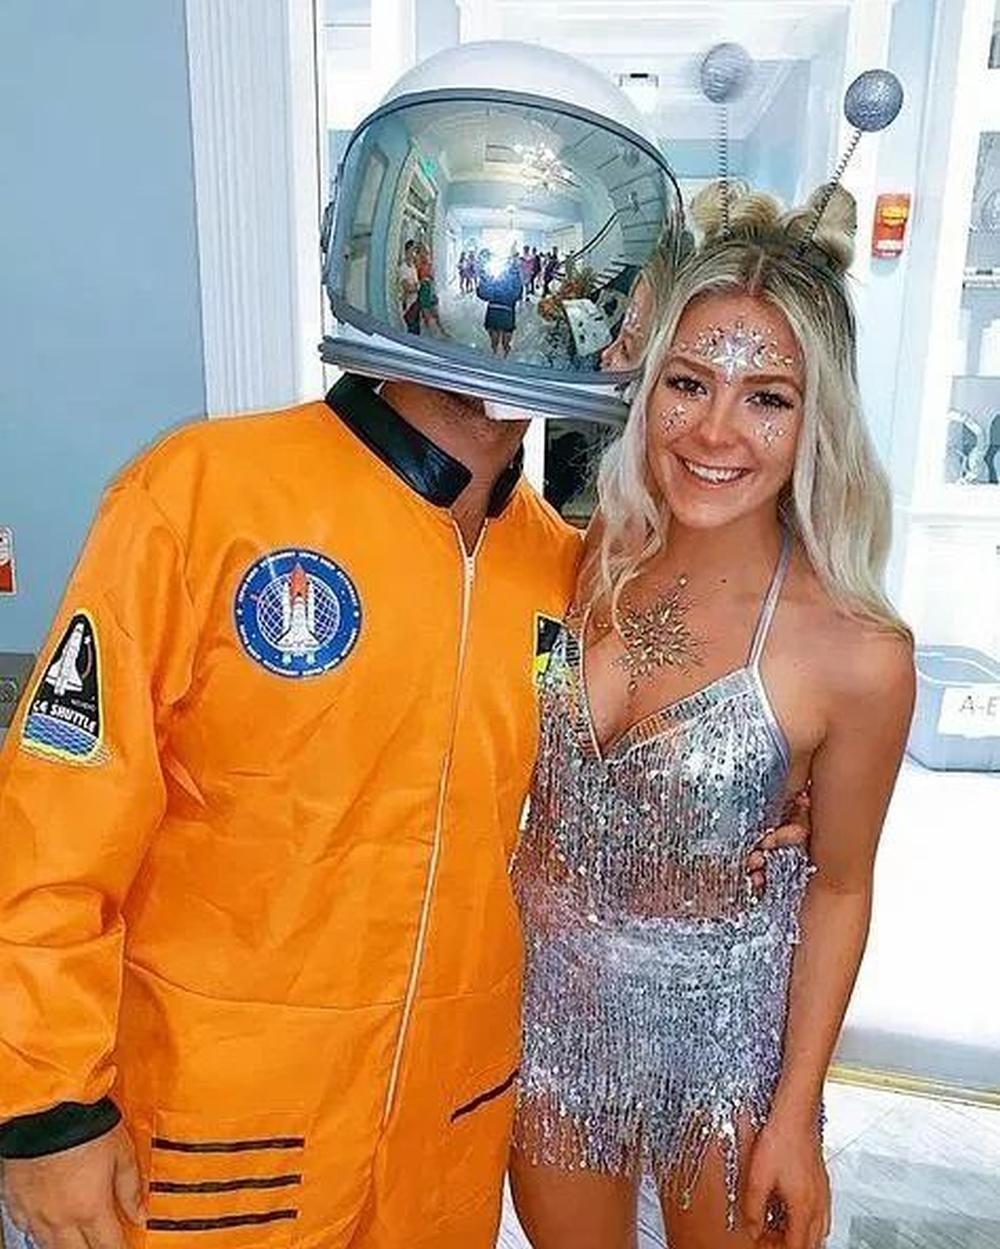 Astronaut and alien cute halloween costumes